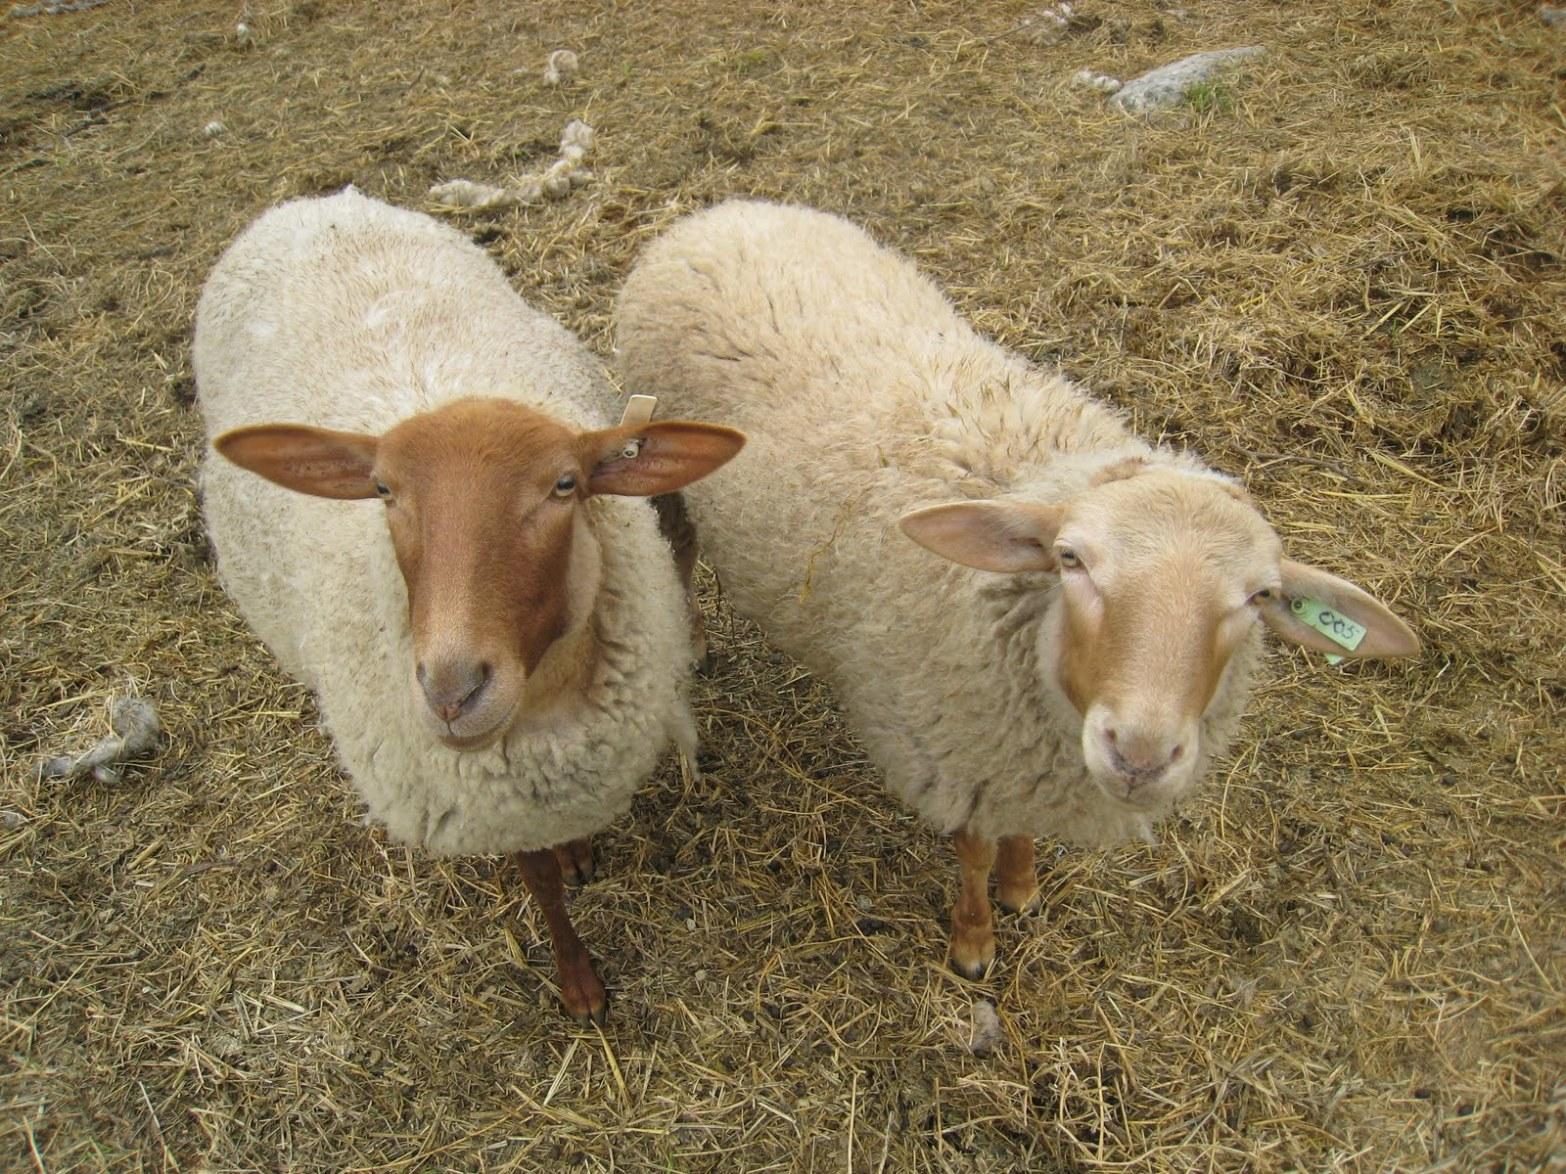 Sheep%2C+California+Red+2